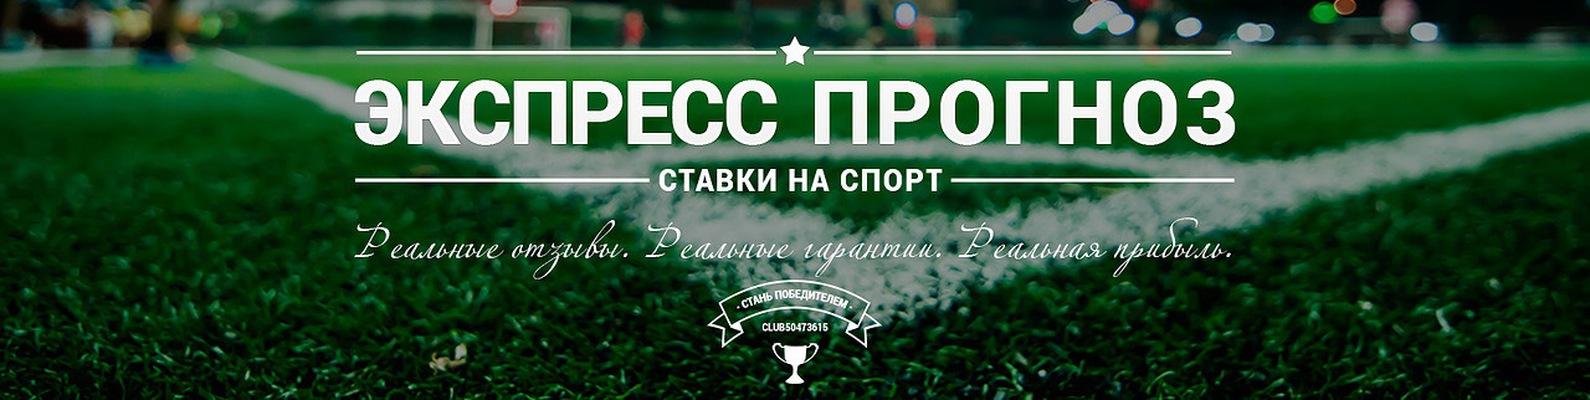 Винлайн виртуальный футбол русский